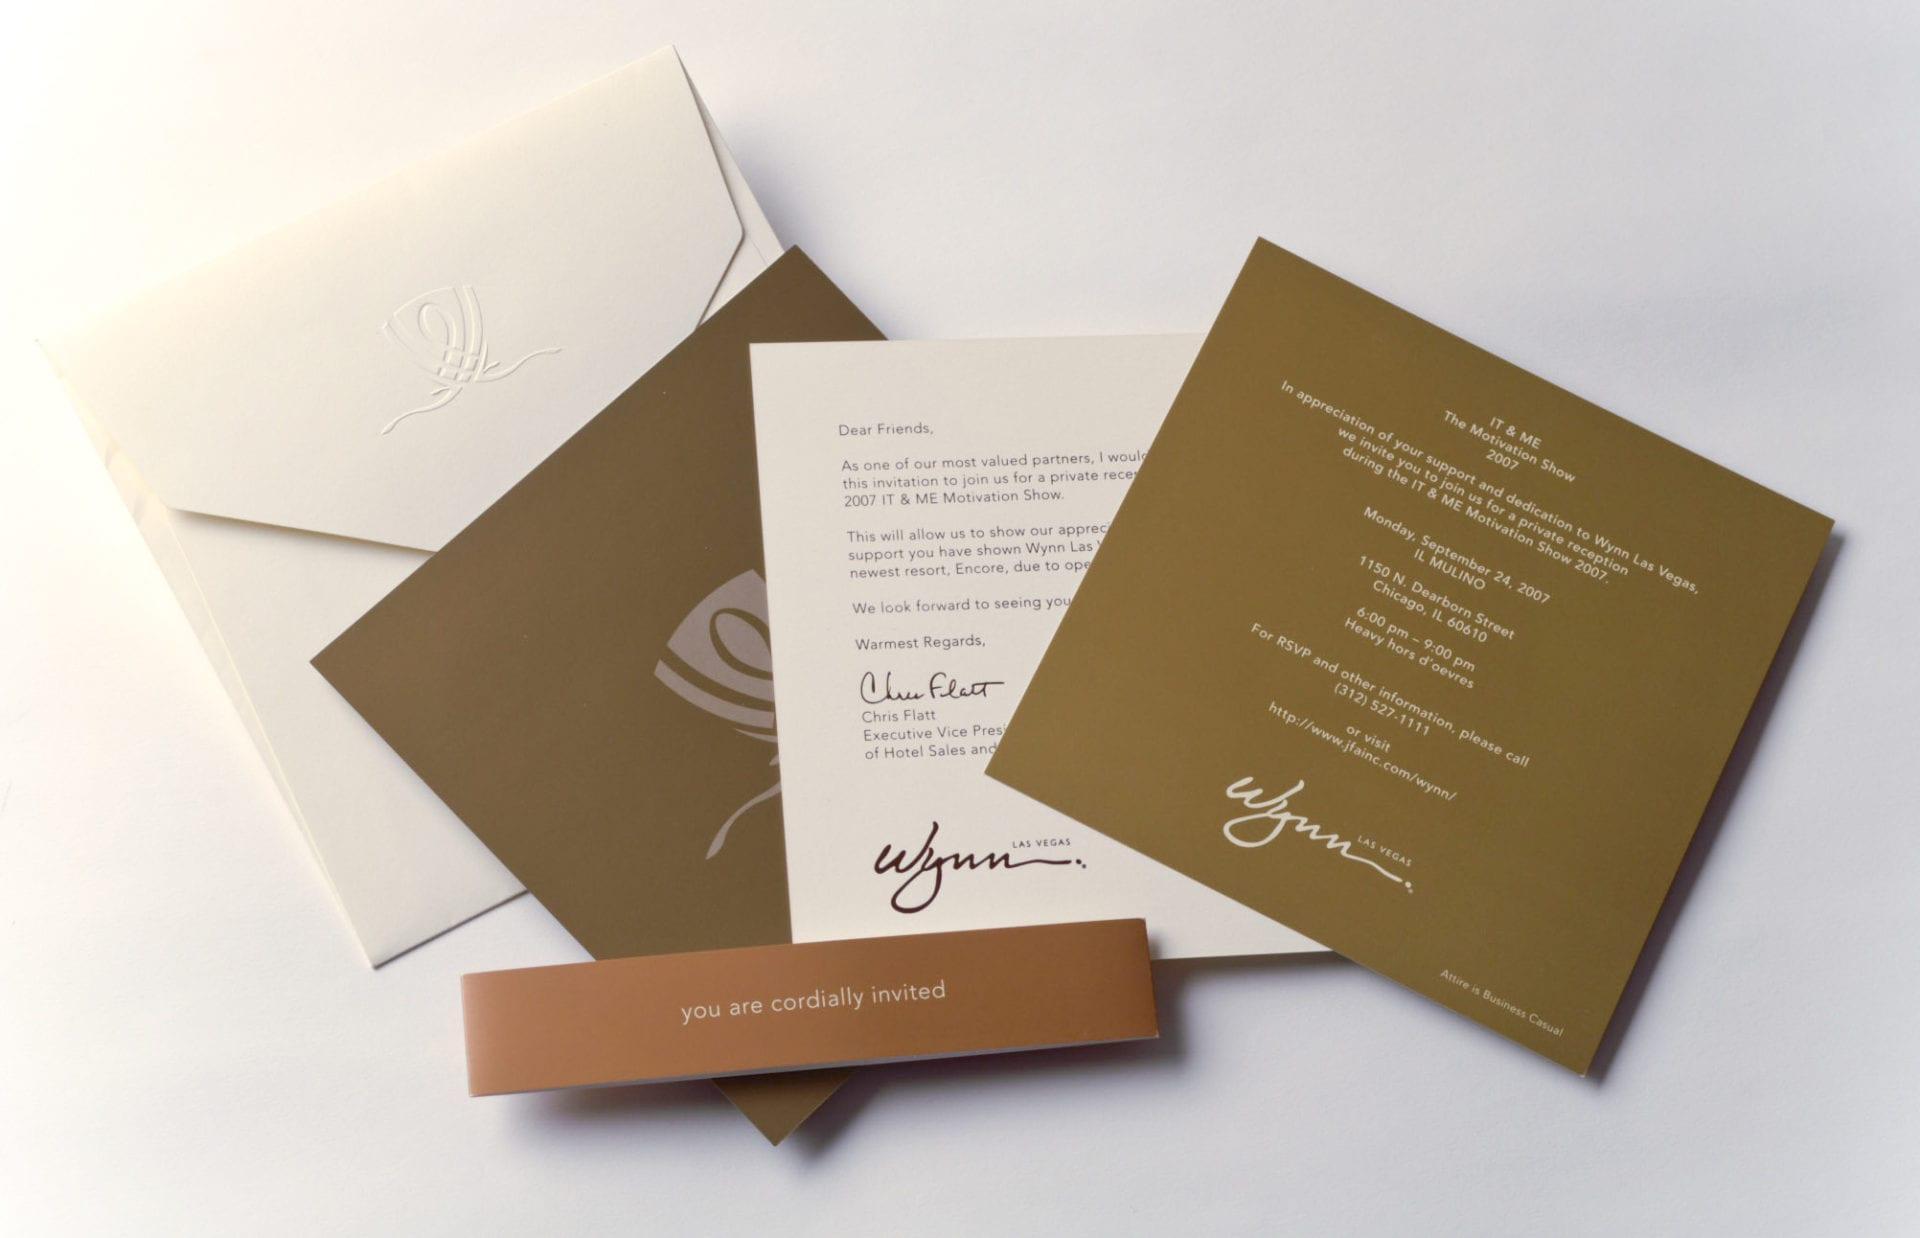 A printed invitation set for the Wynn Las Vegas